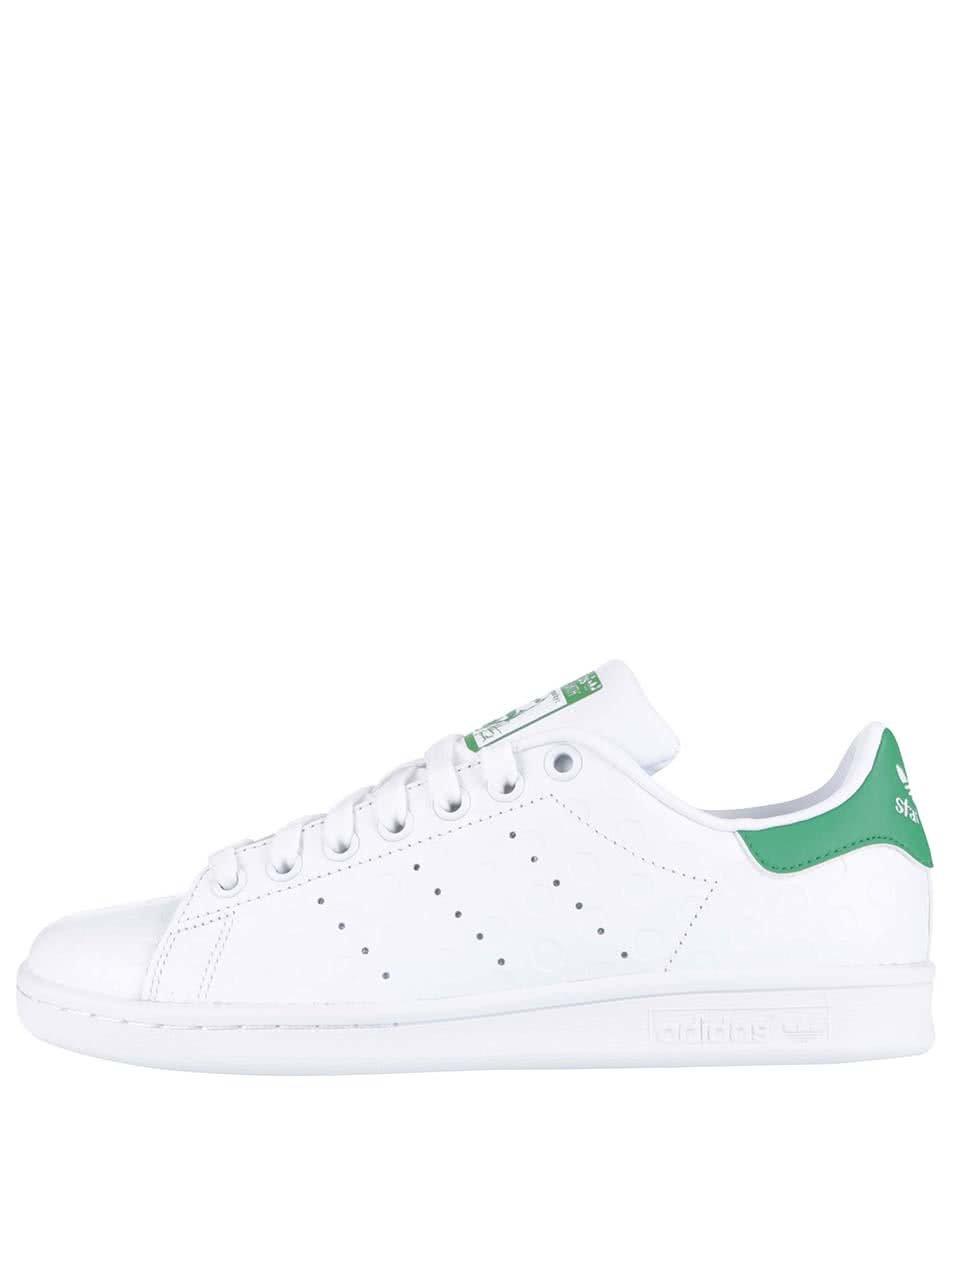 Bílé dámské kožené tenisky s plastickým vzorem adidas Originals Stan Smith